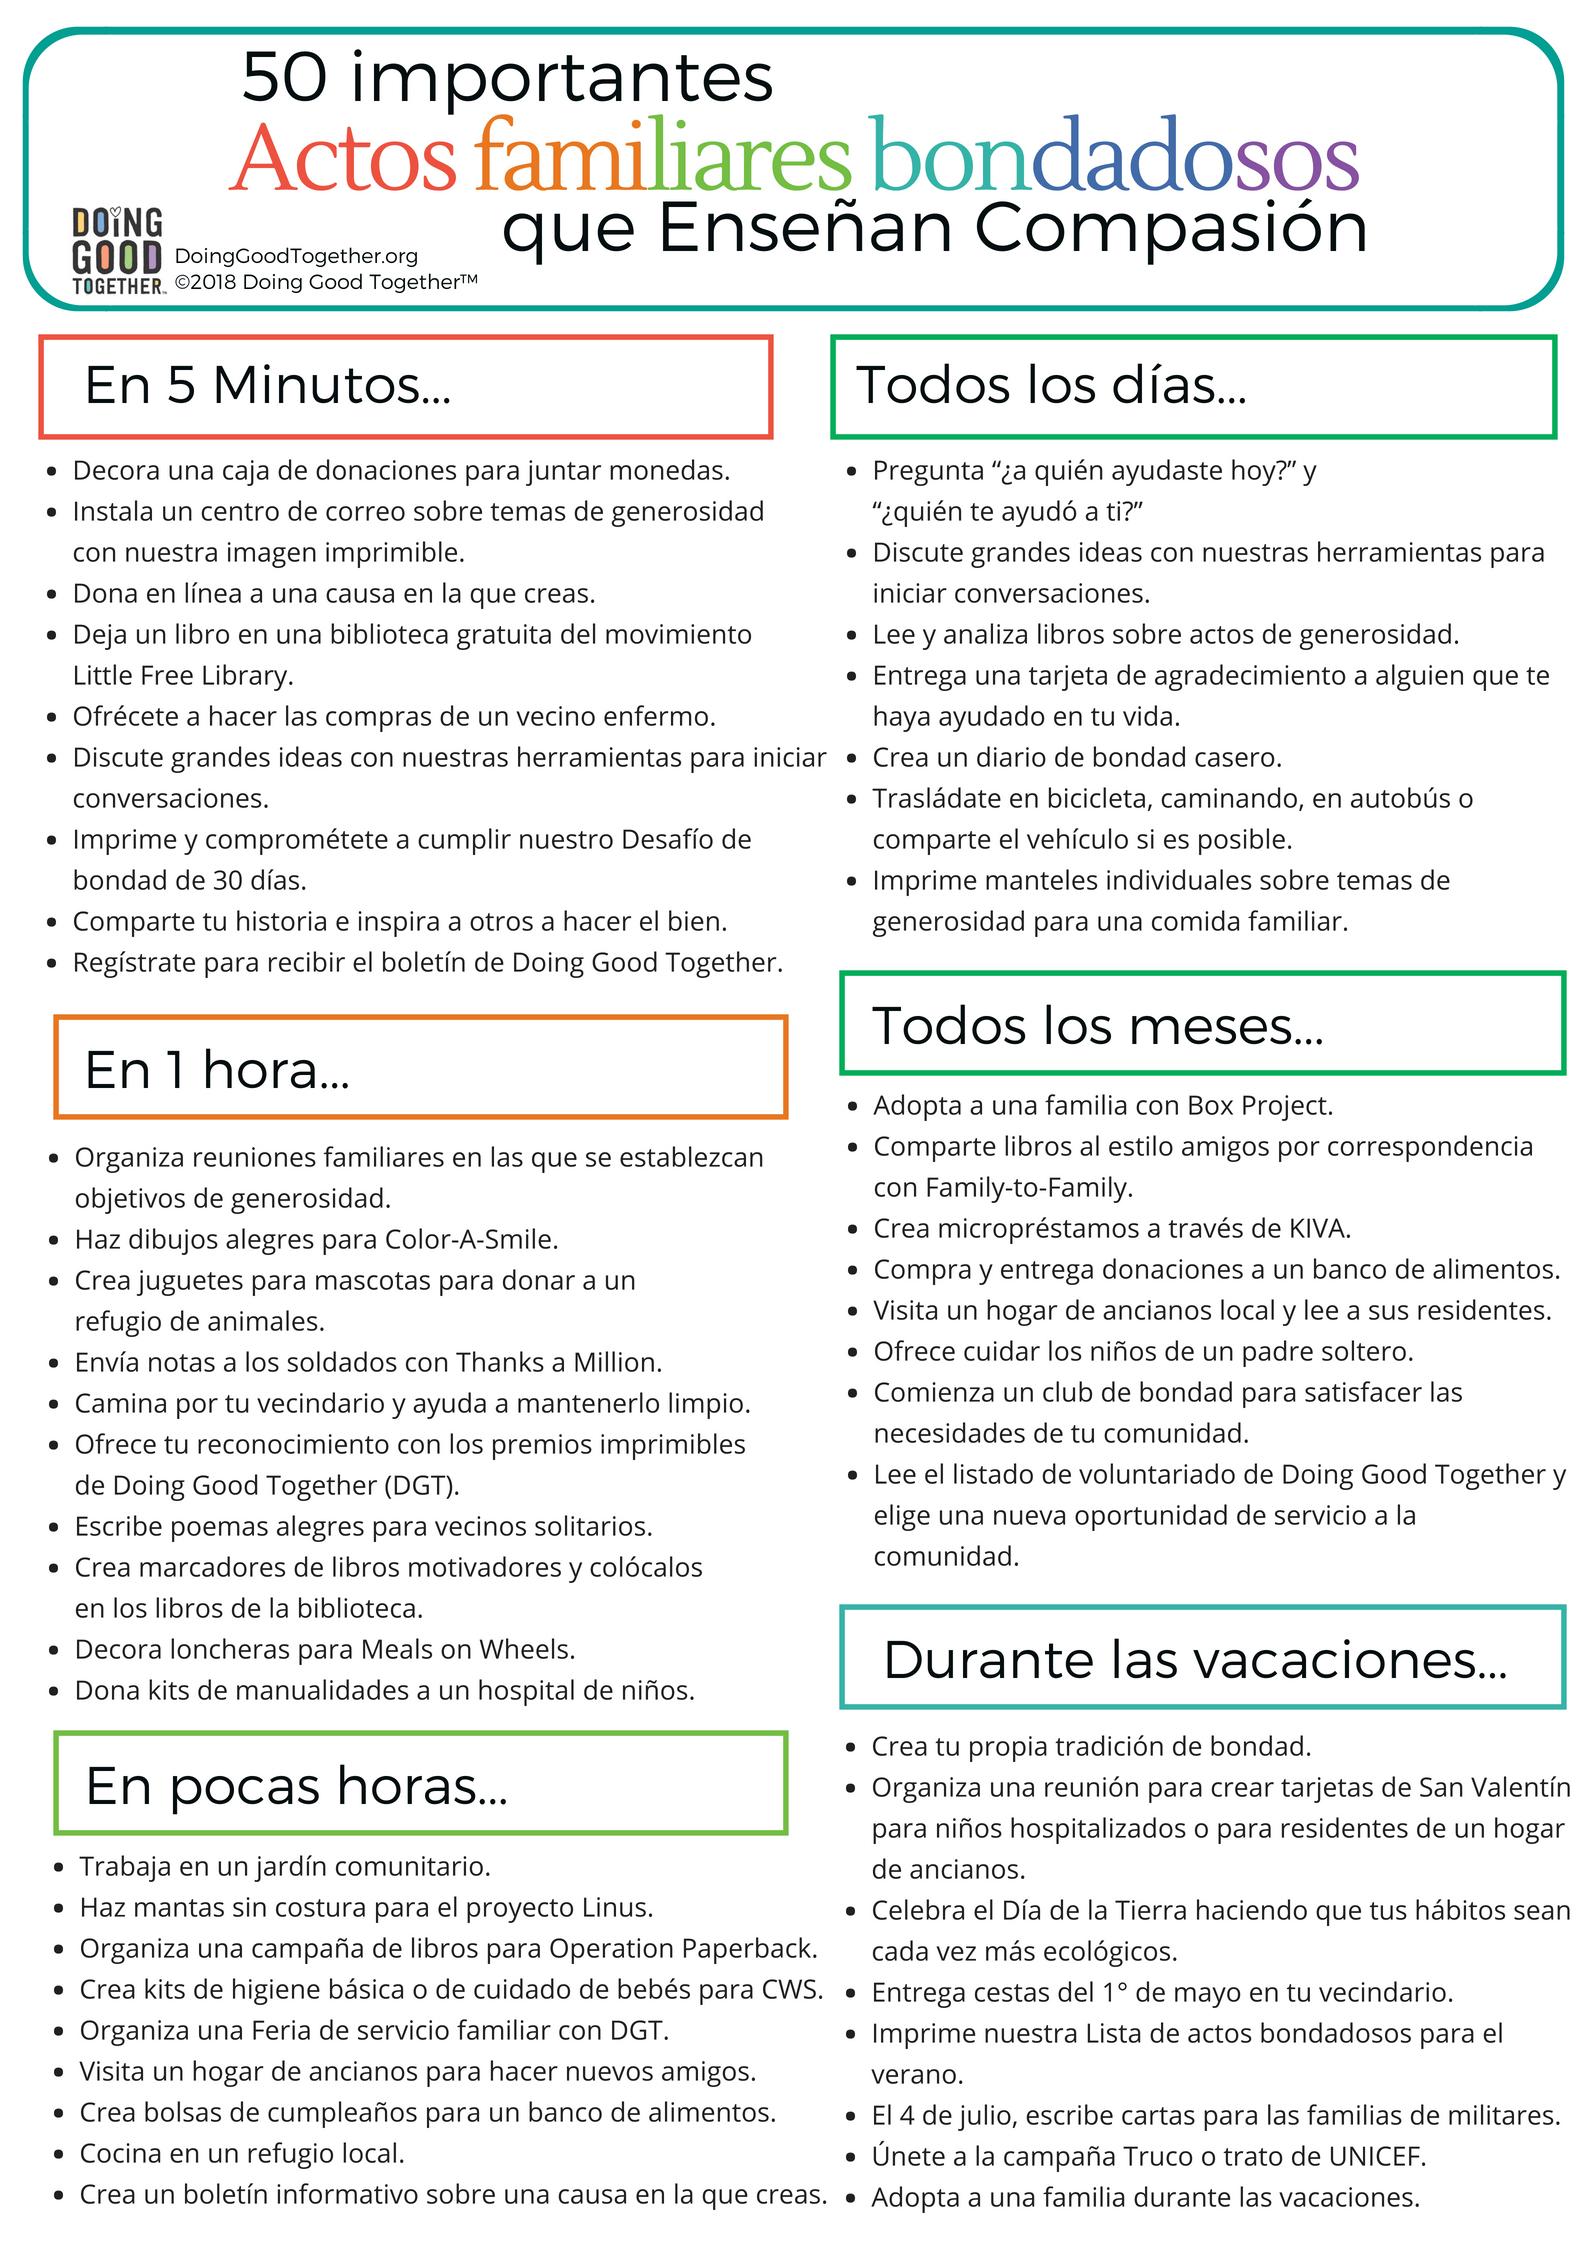 Click to print the Spanish verison.